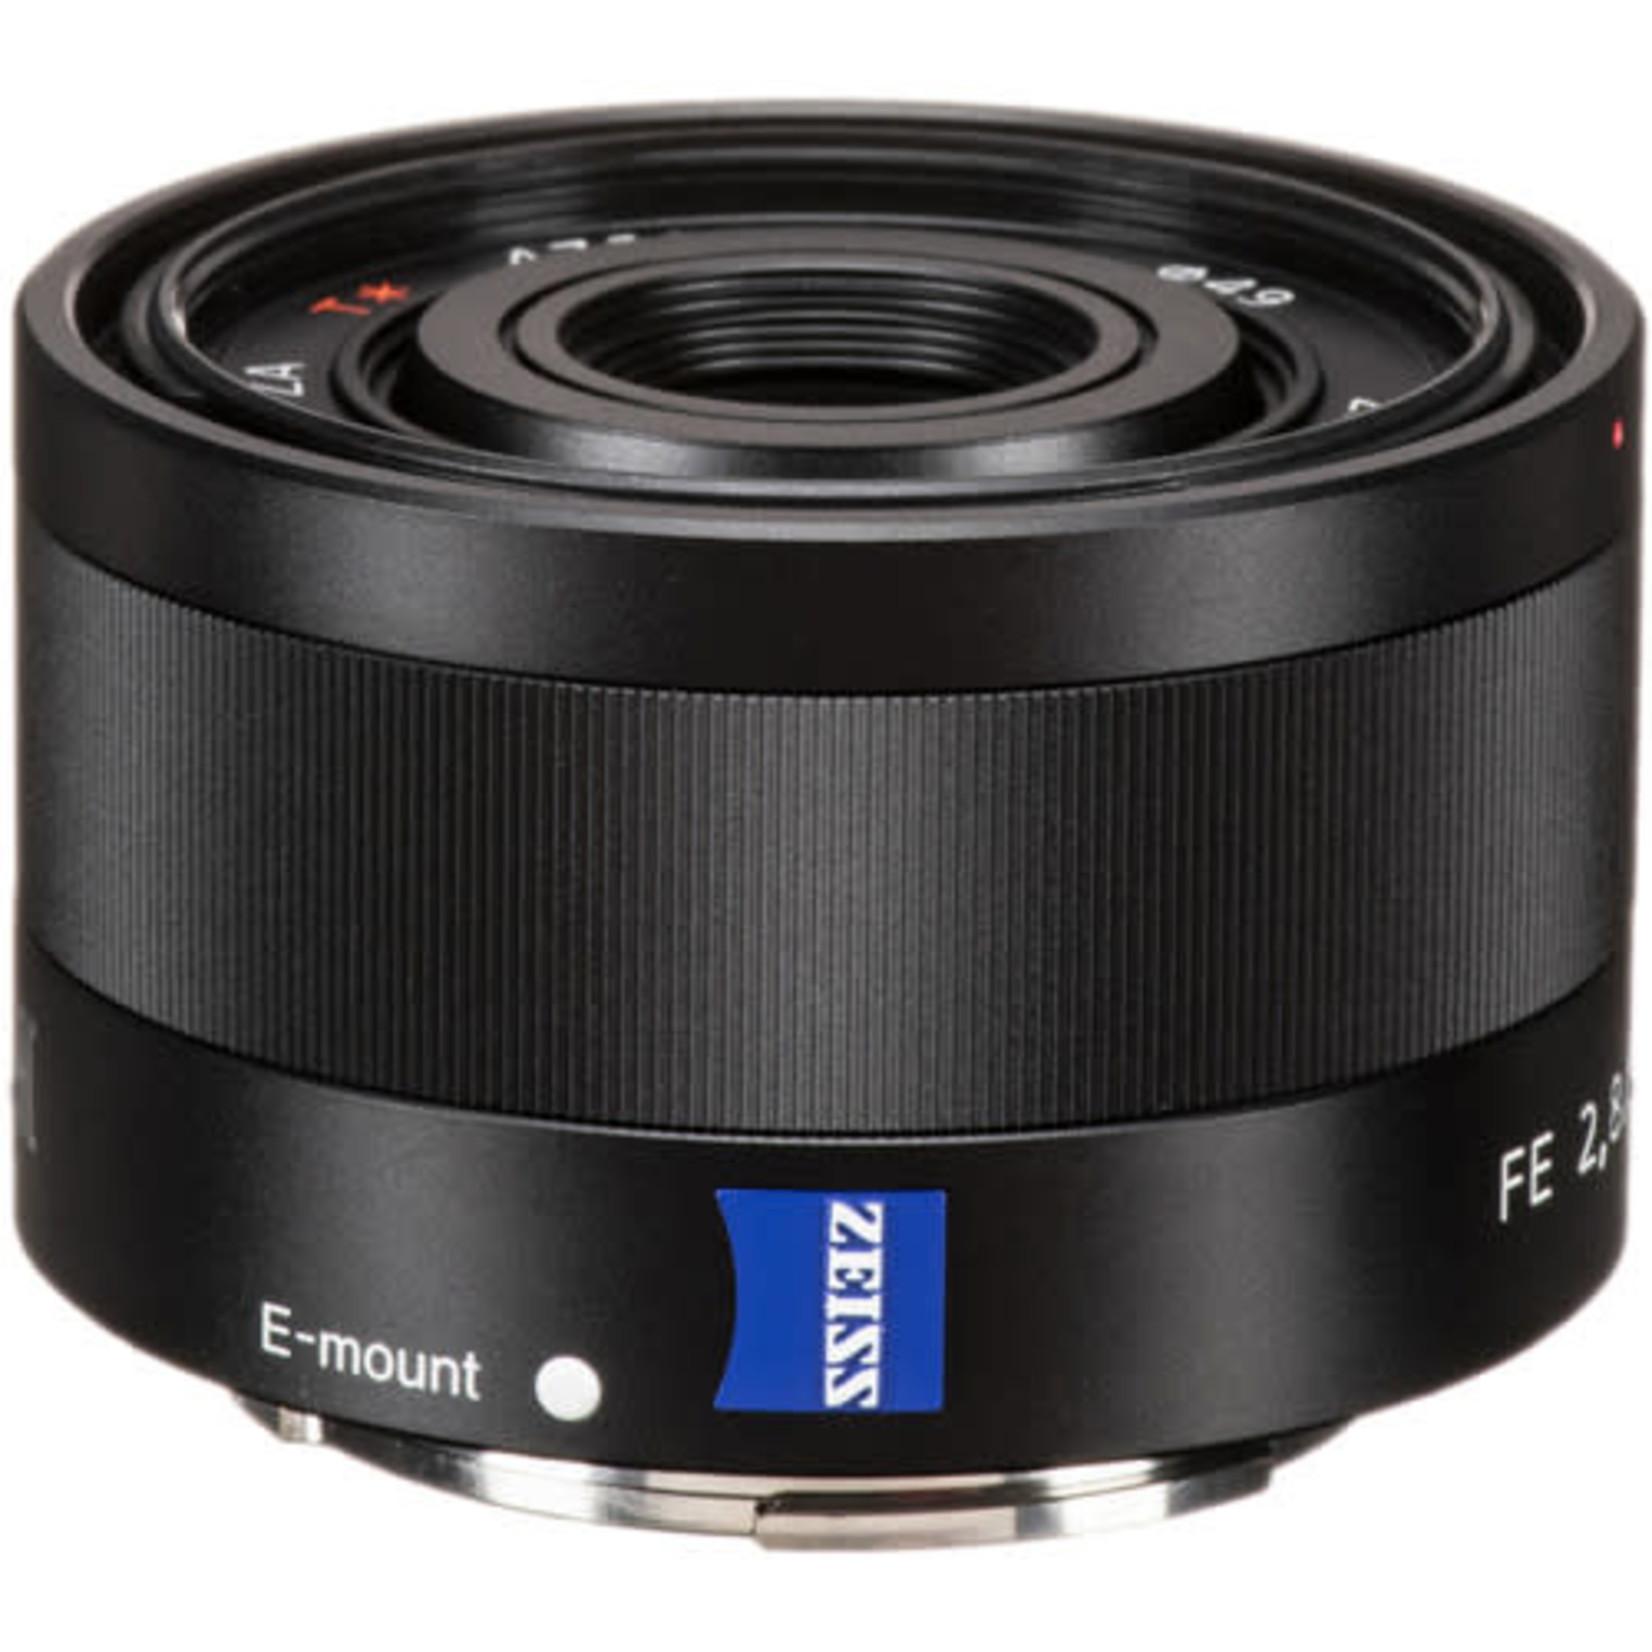 Sony Sony Sonnar T* FE 35mm f/2.8 ZA Lens